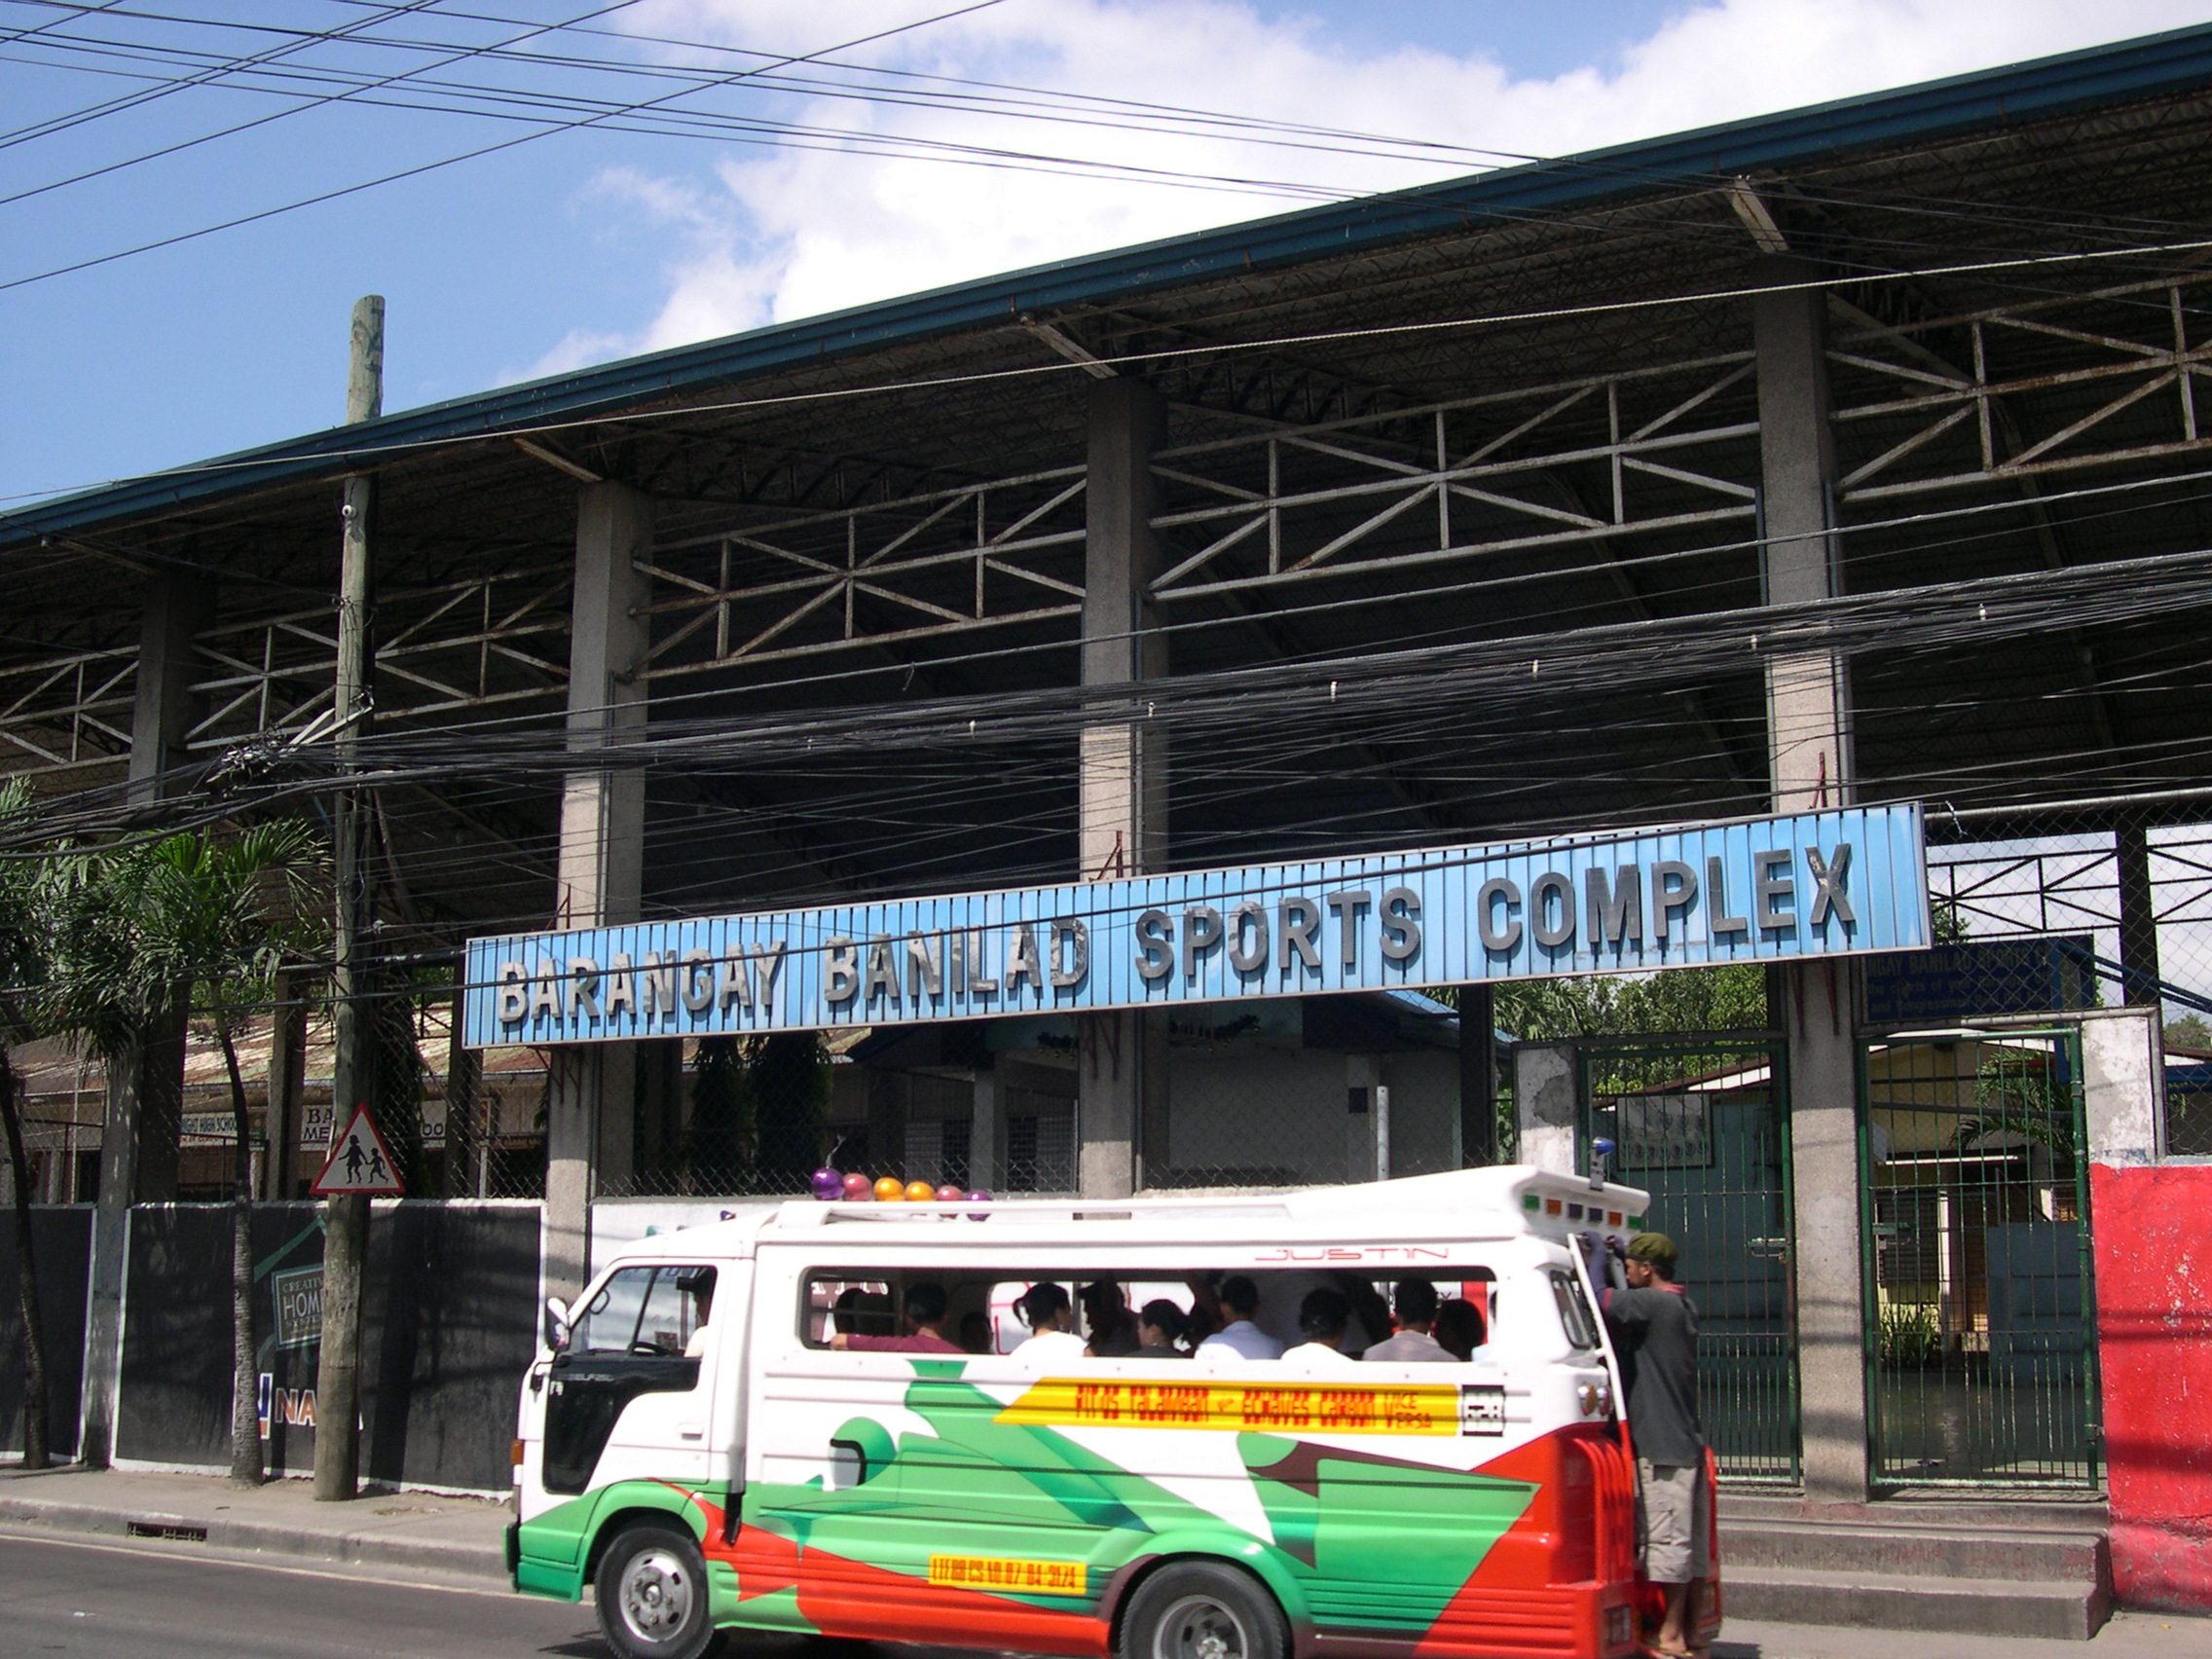 File:Cebu City Banilad Sports Complex.jpg - Wikimedia Commons